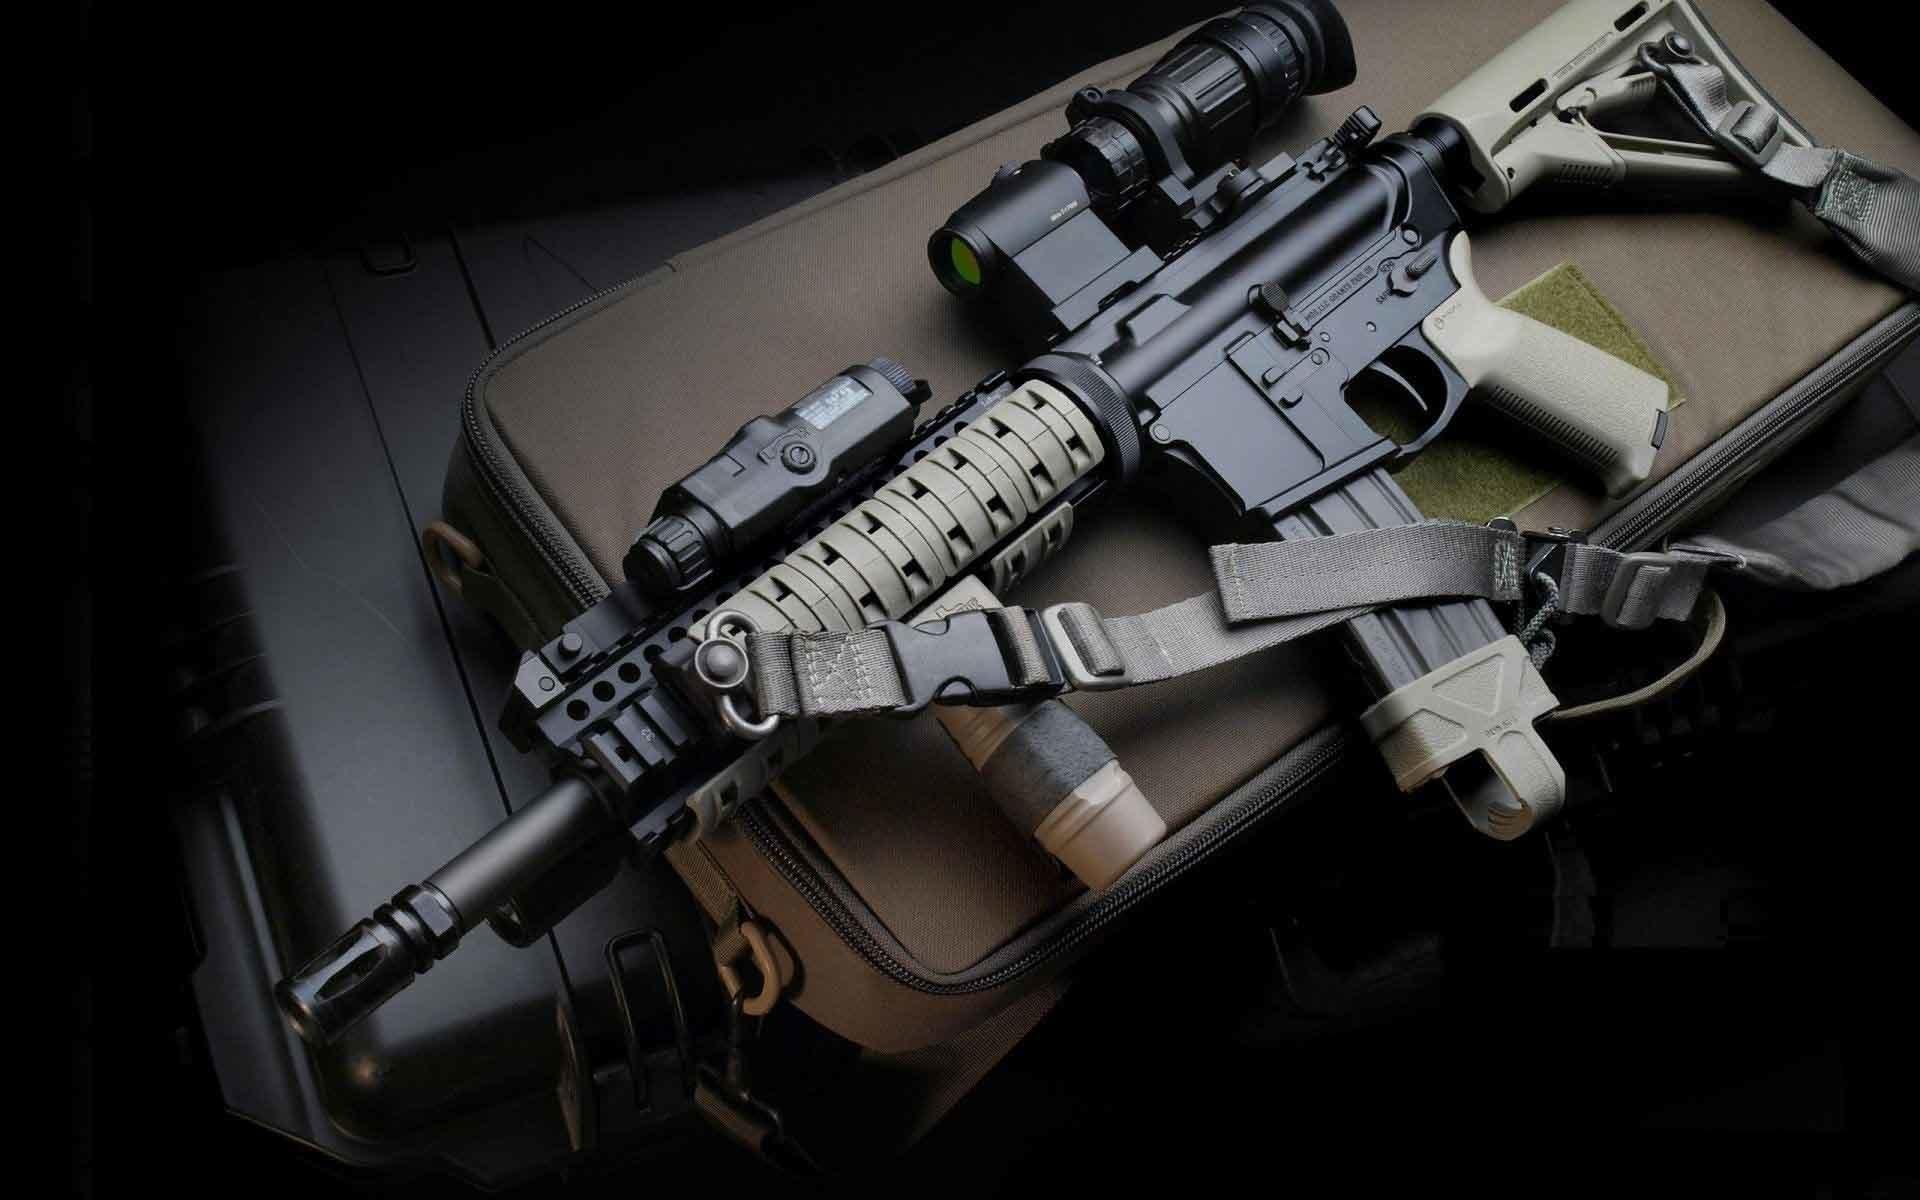 3200x2000 Image For Sniper Rifle Wallpaper Desktop Background